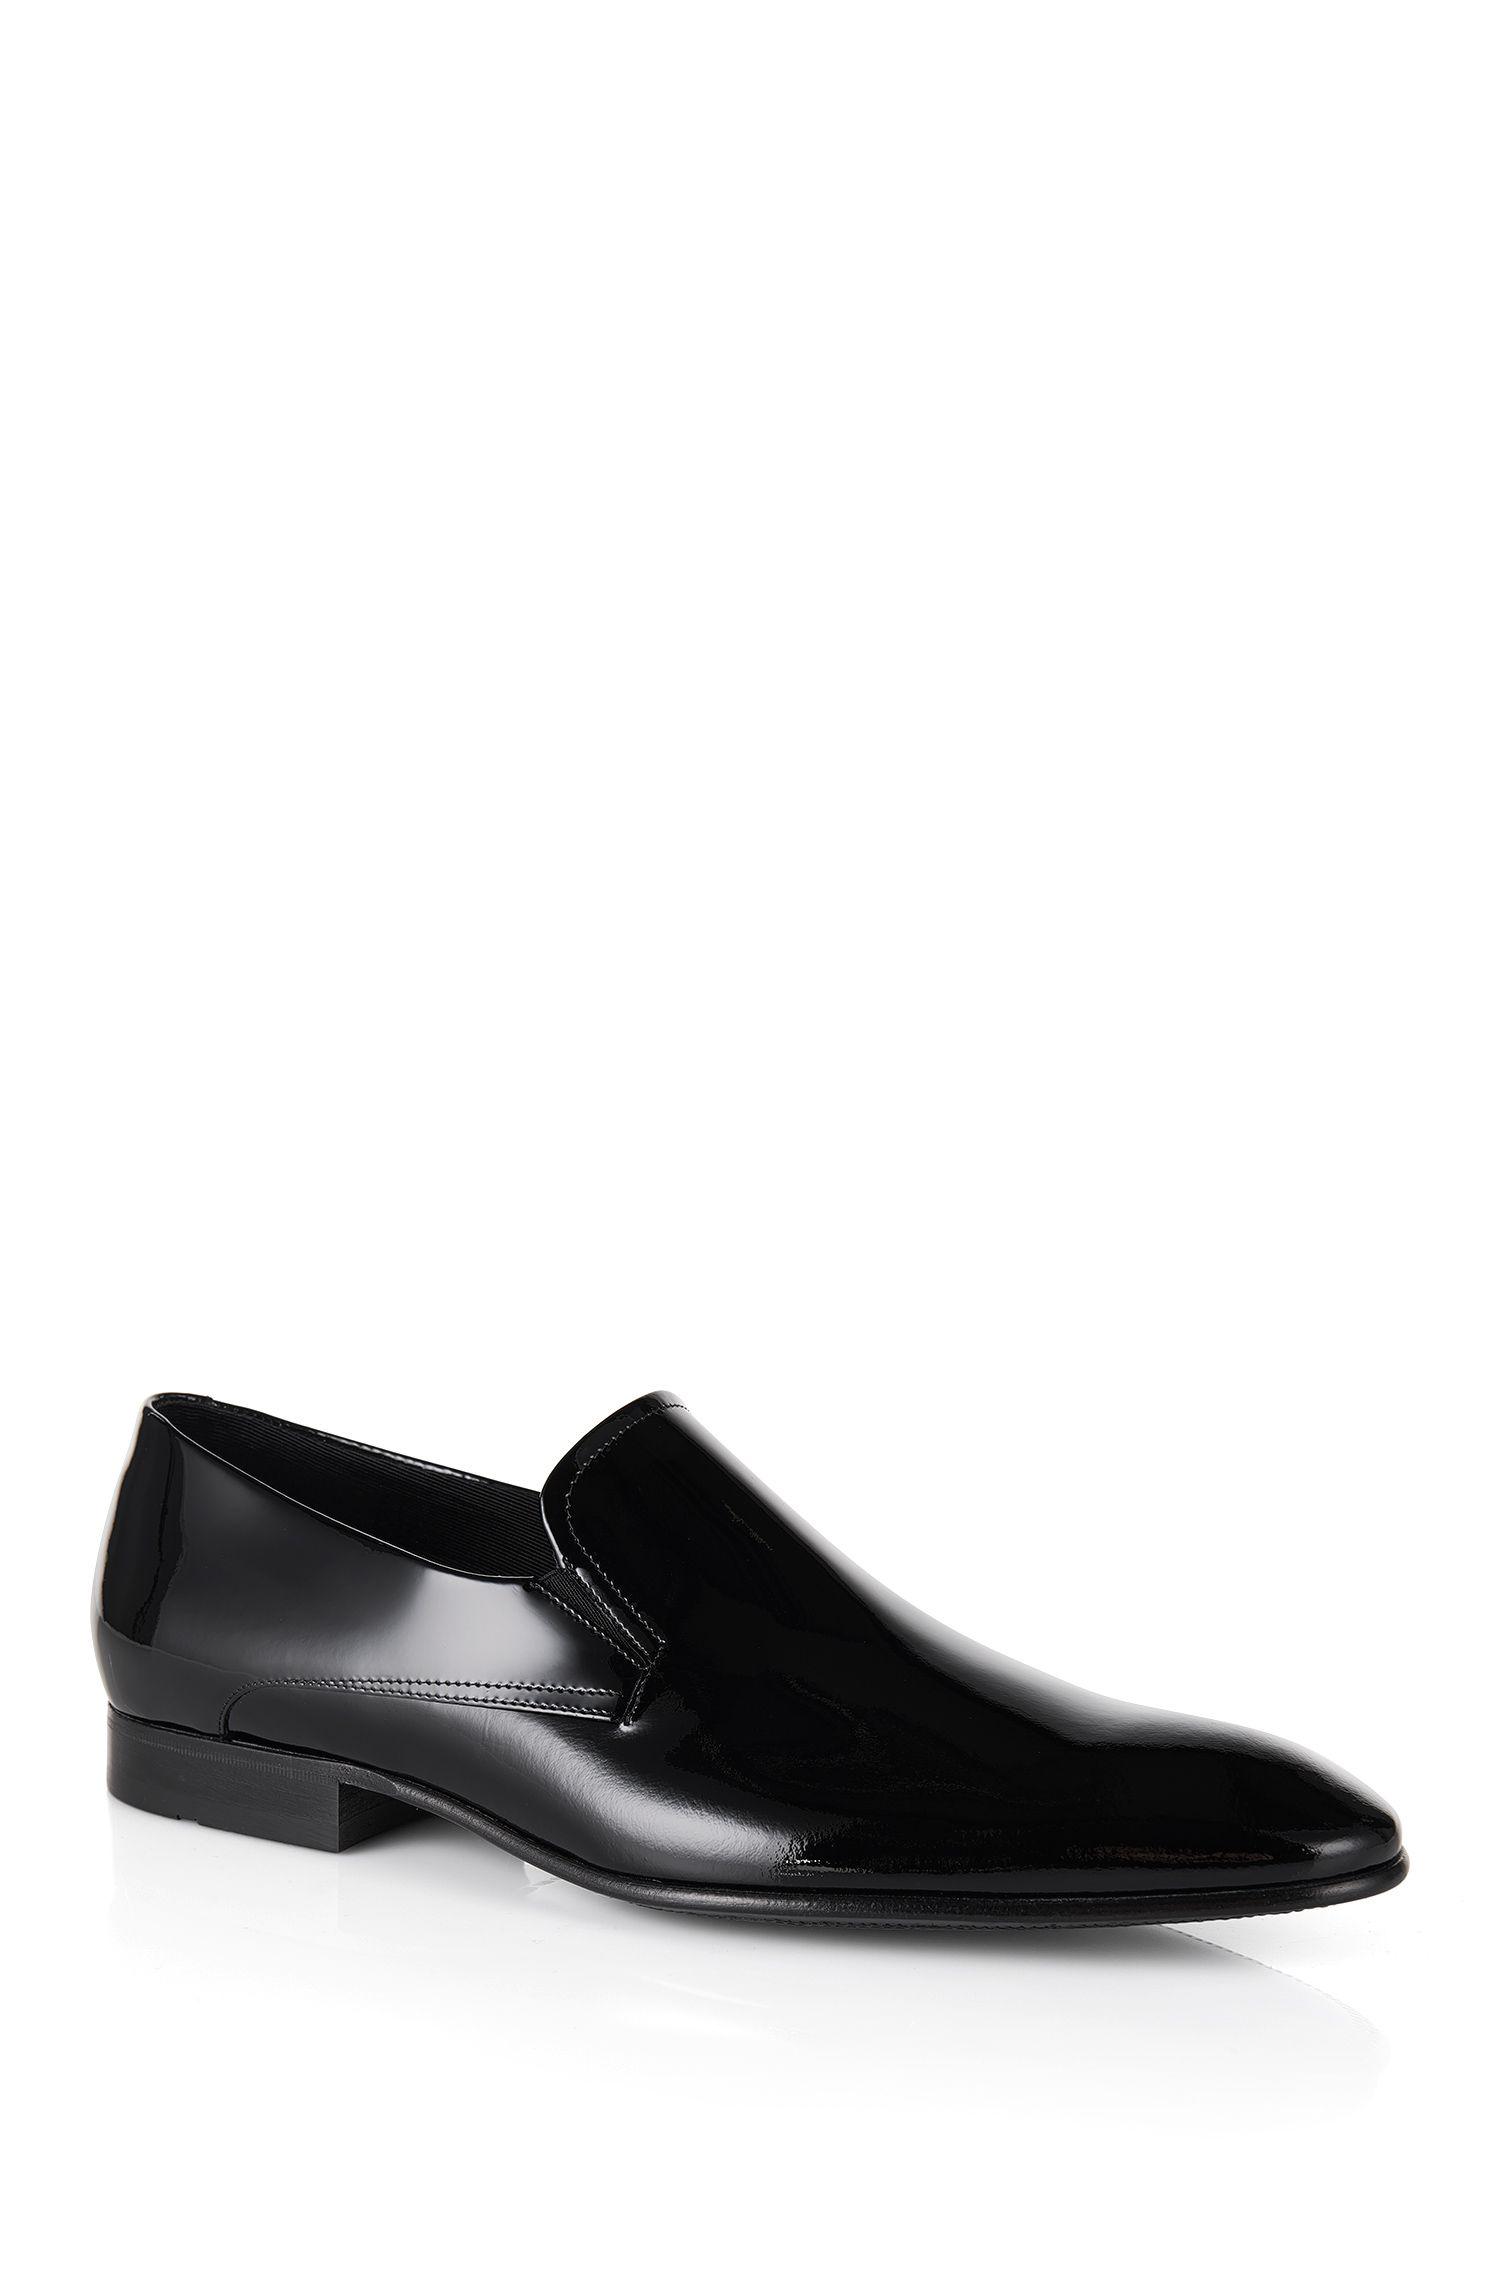 'Eveslip' | Italian Calfskin Patent Loafers